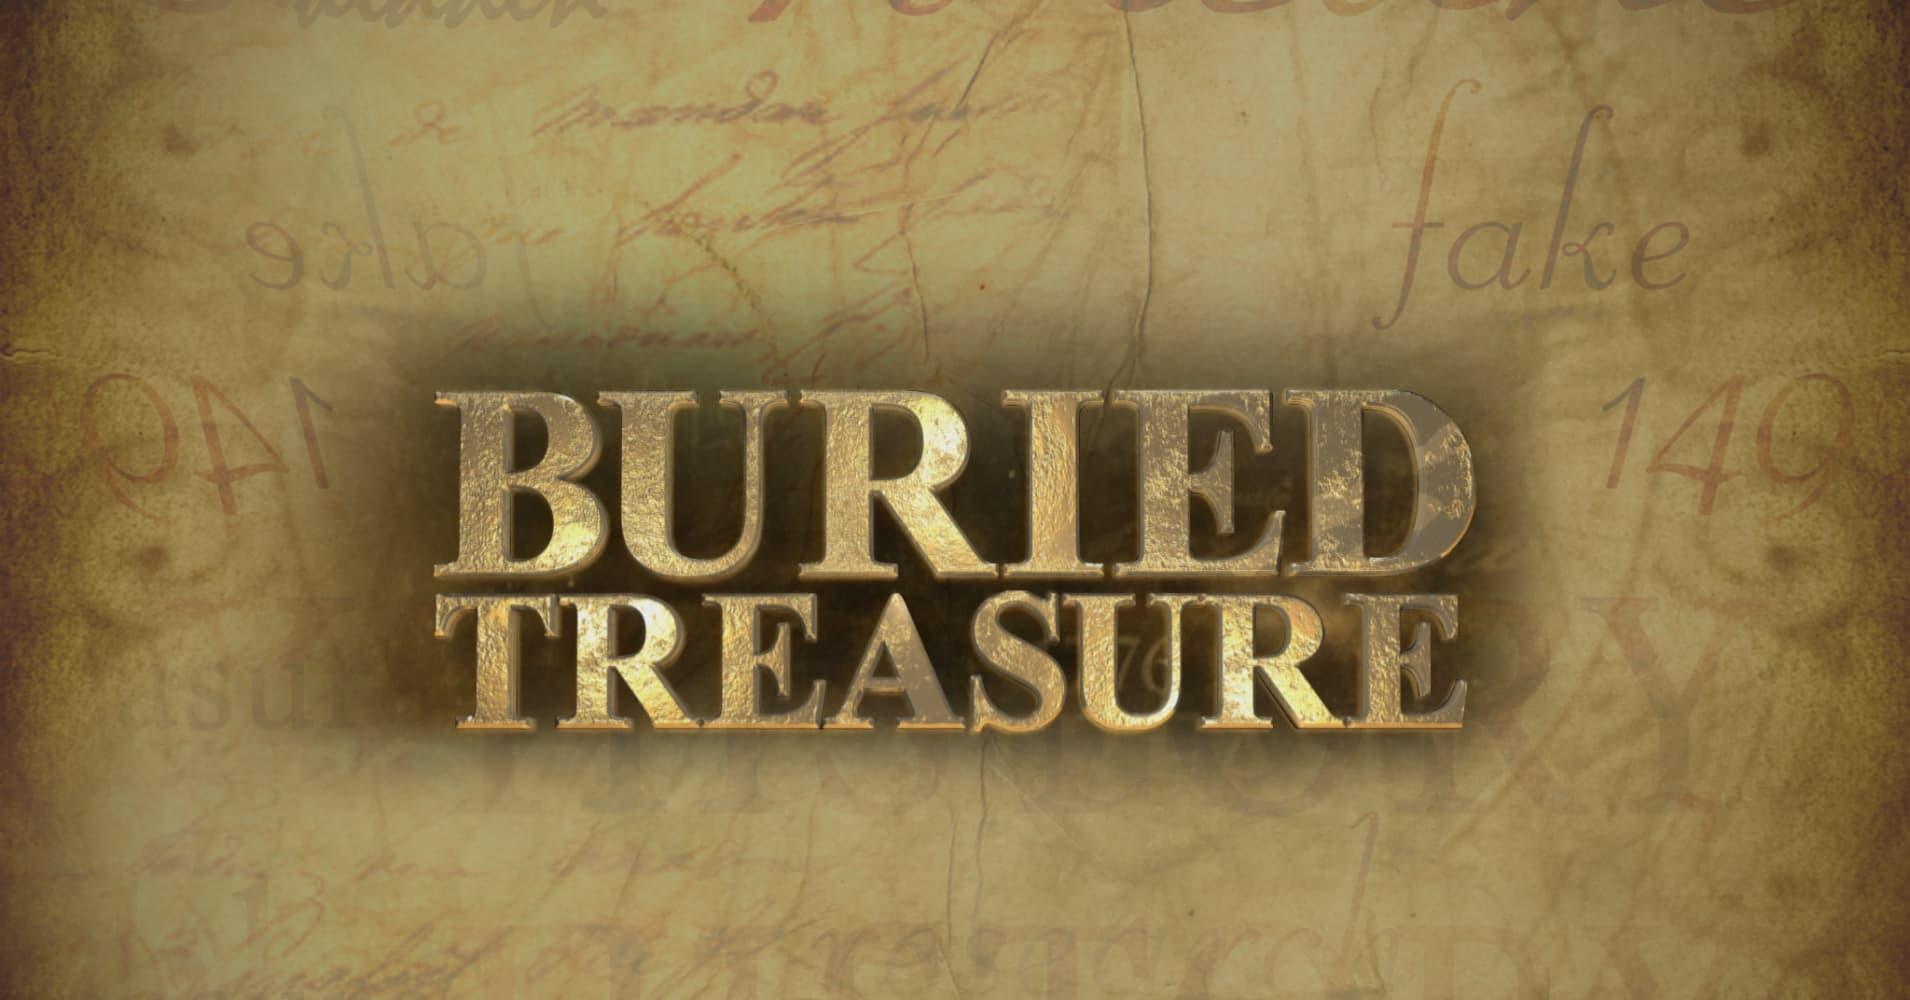 Buried treasure   Term paper - August 2019 - 1001 words